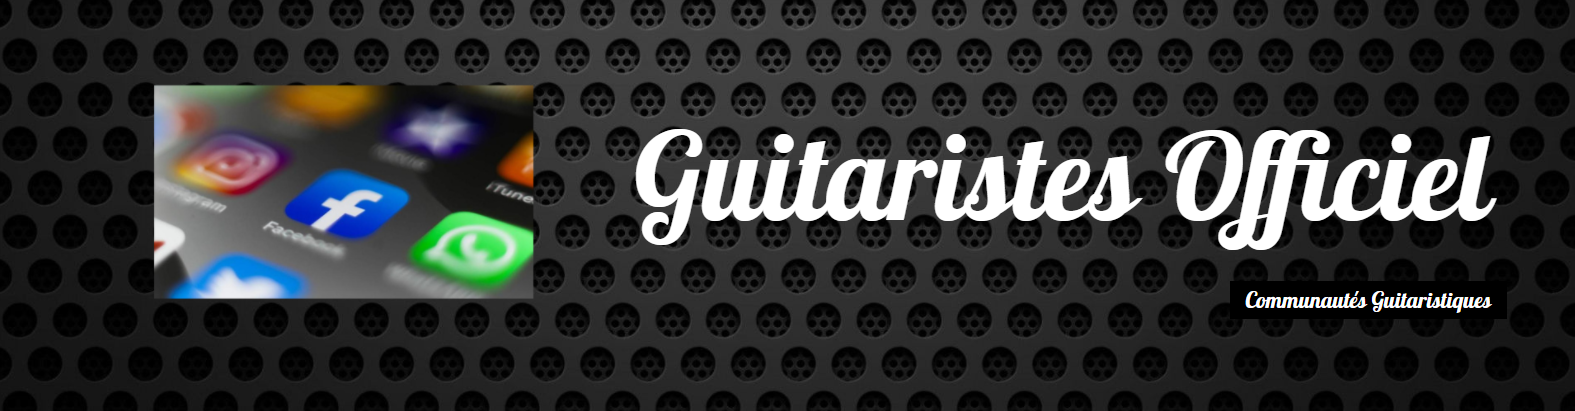 Guitaristes Officiel